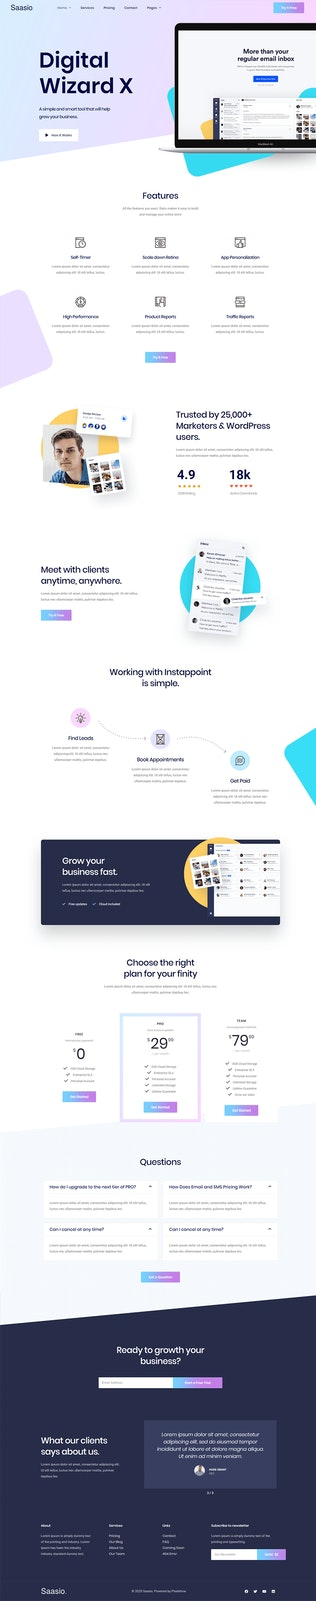 Thumbnail for Saasio - Saas & Startup Elementor Template Kit